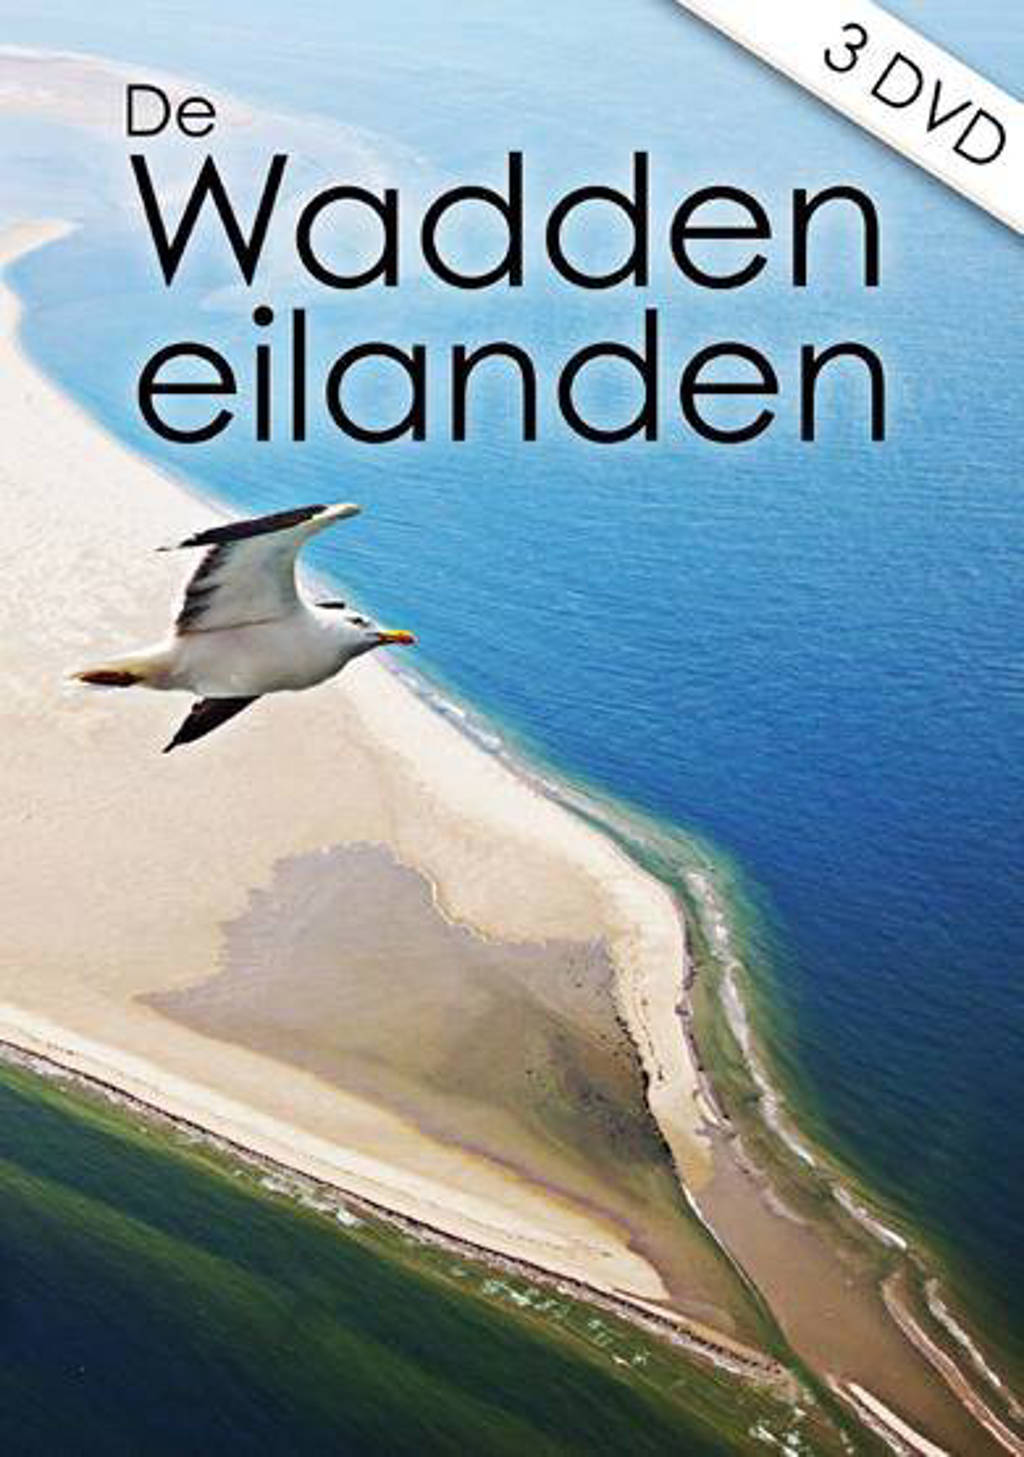 Waddeneilanden (DVD)